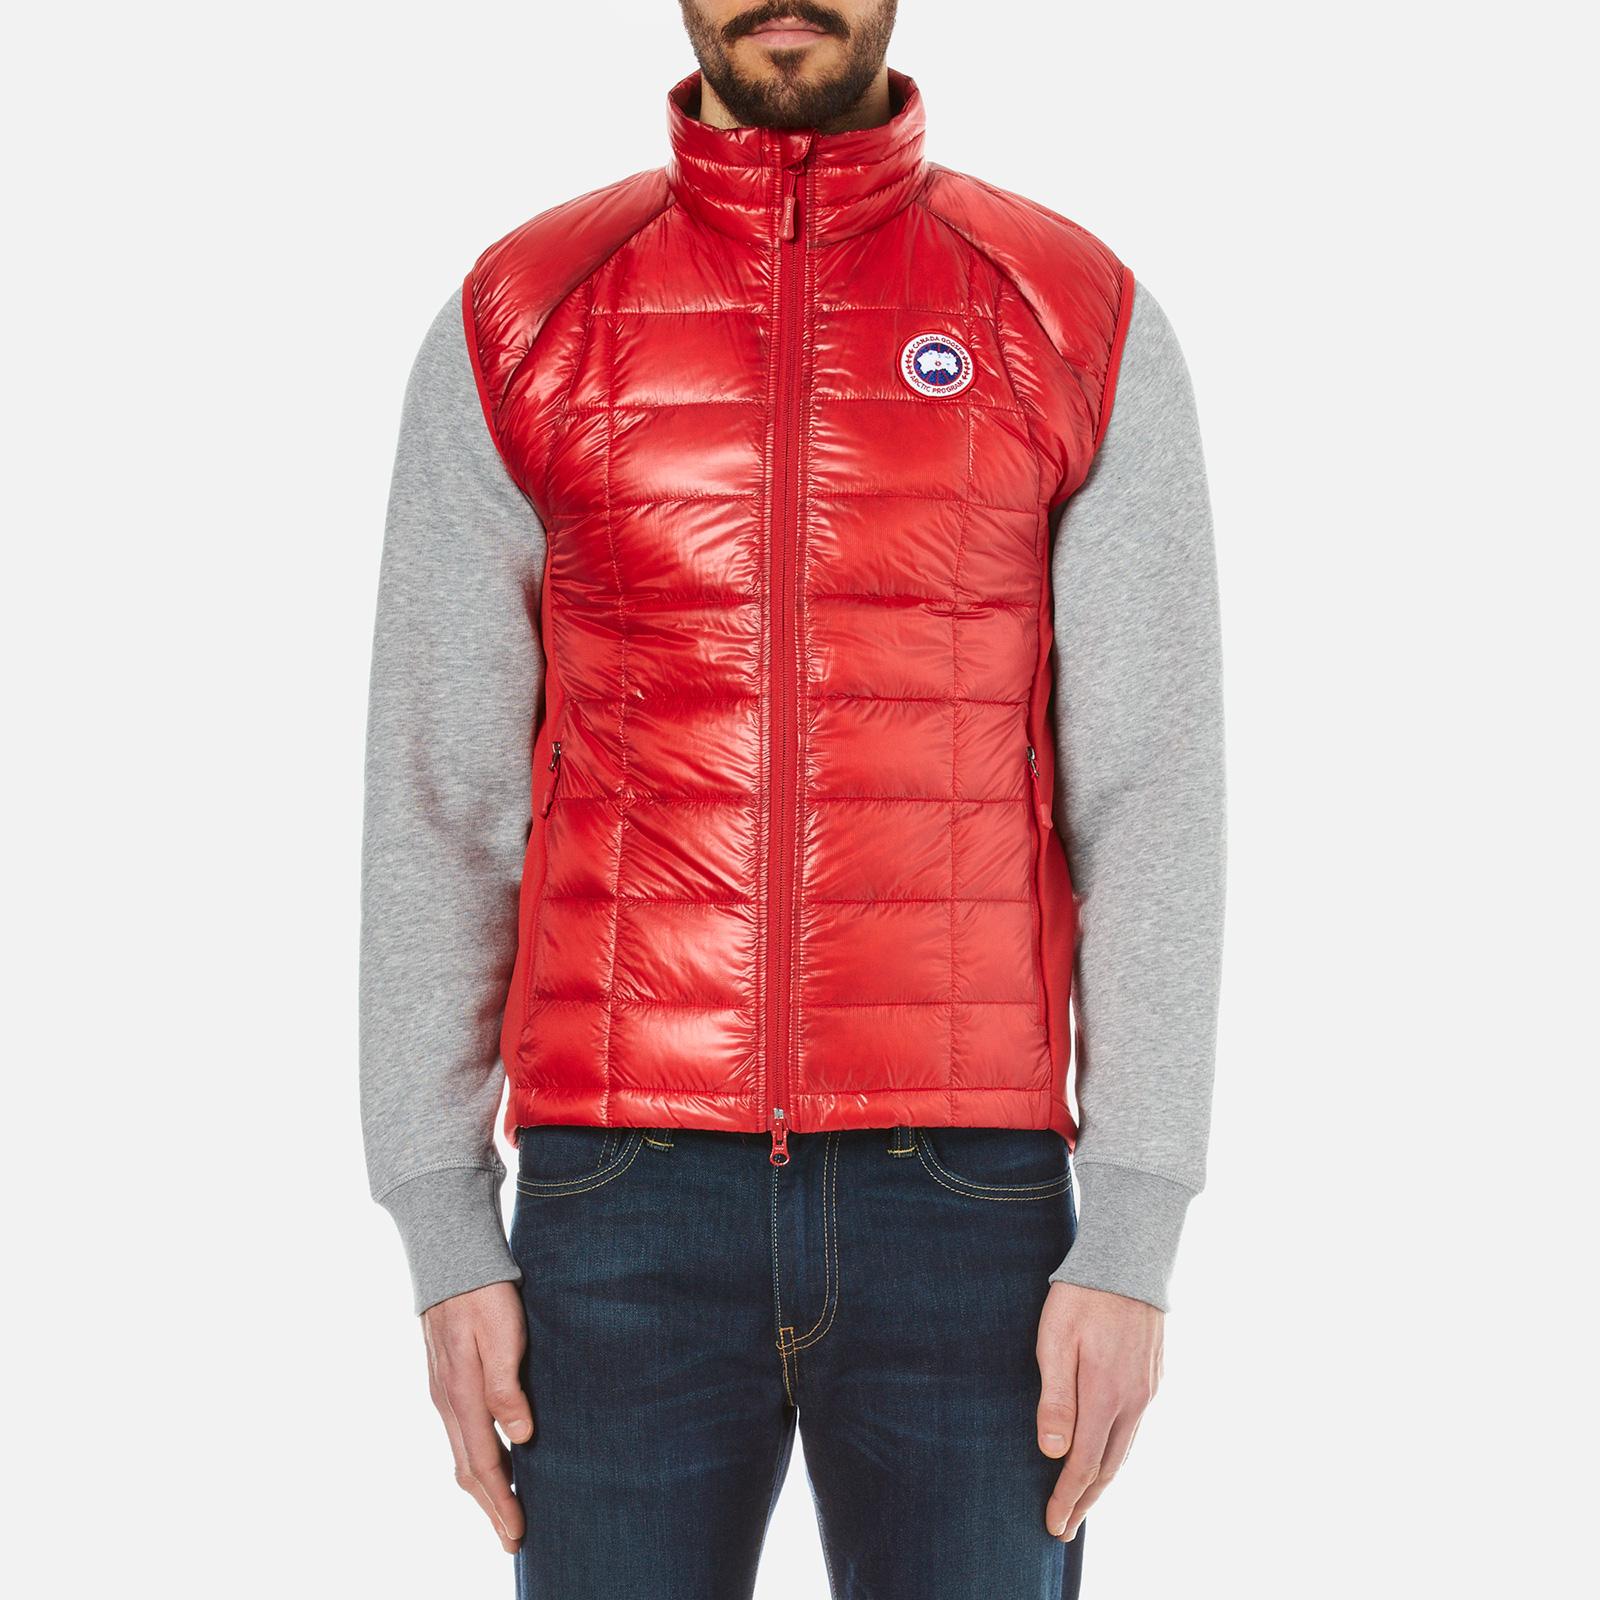 97b73536b04f Canada Goose Men s Hybridge Lite Vest - Red - Free UK Delivery over £50